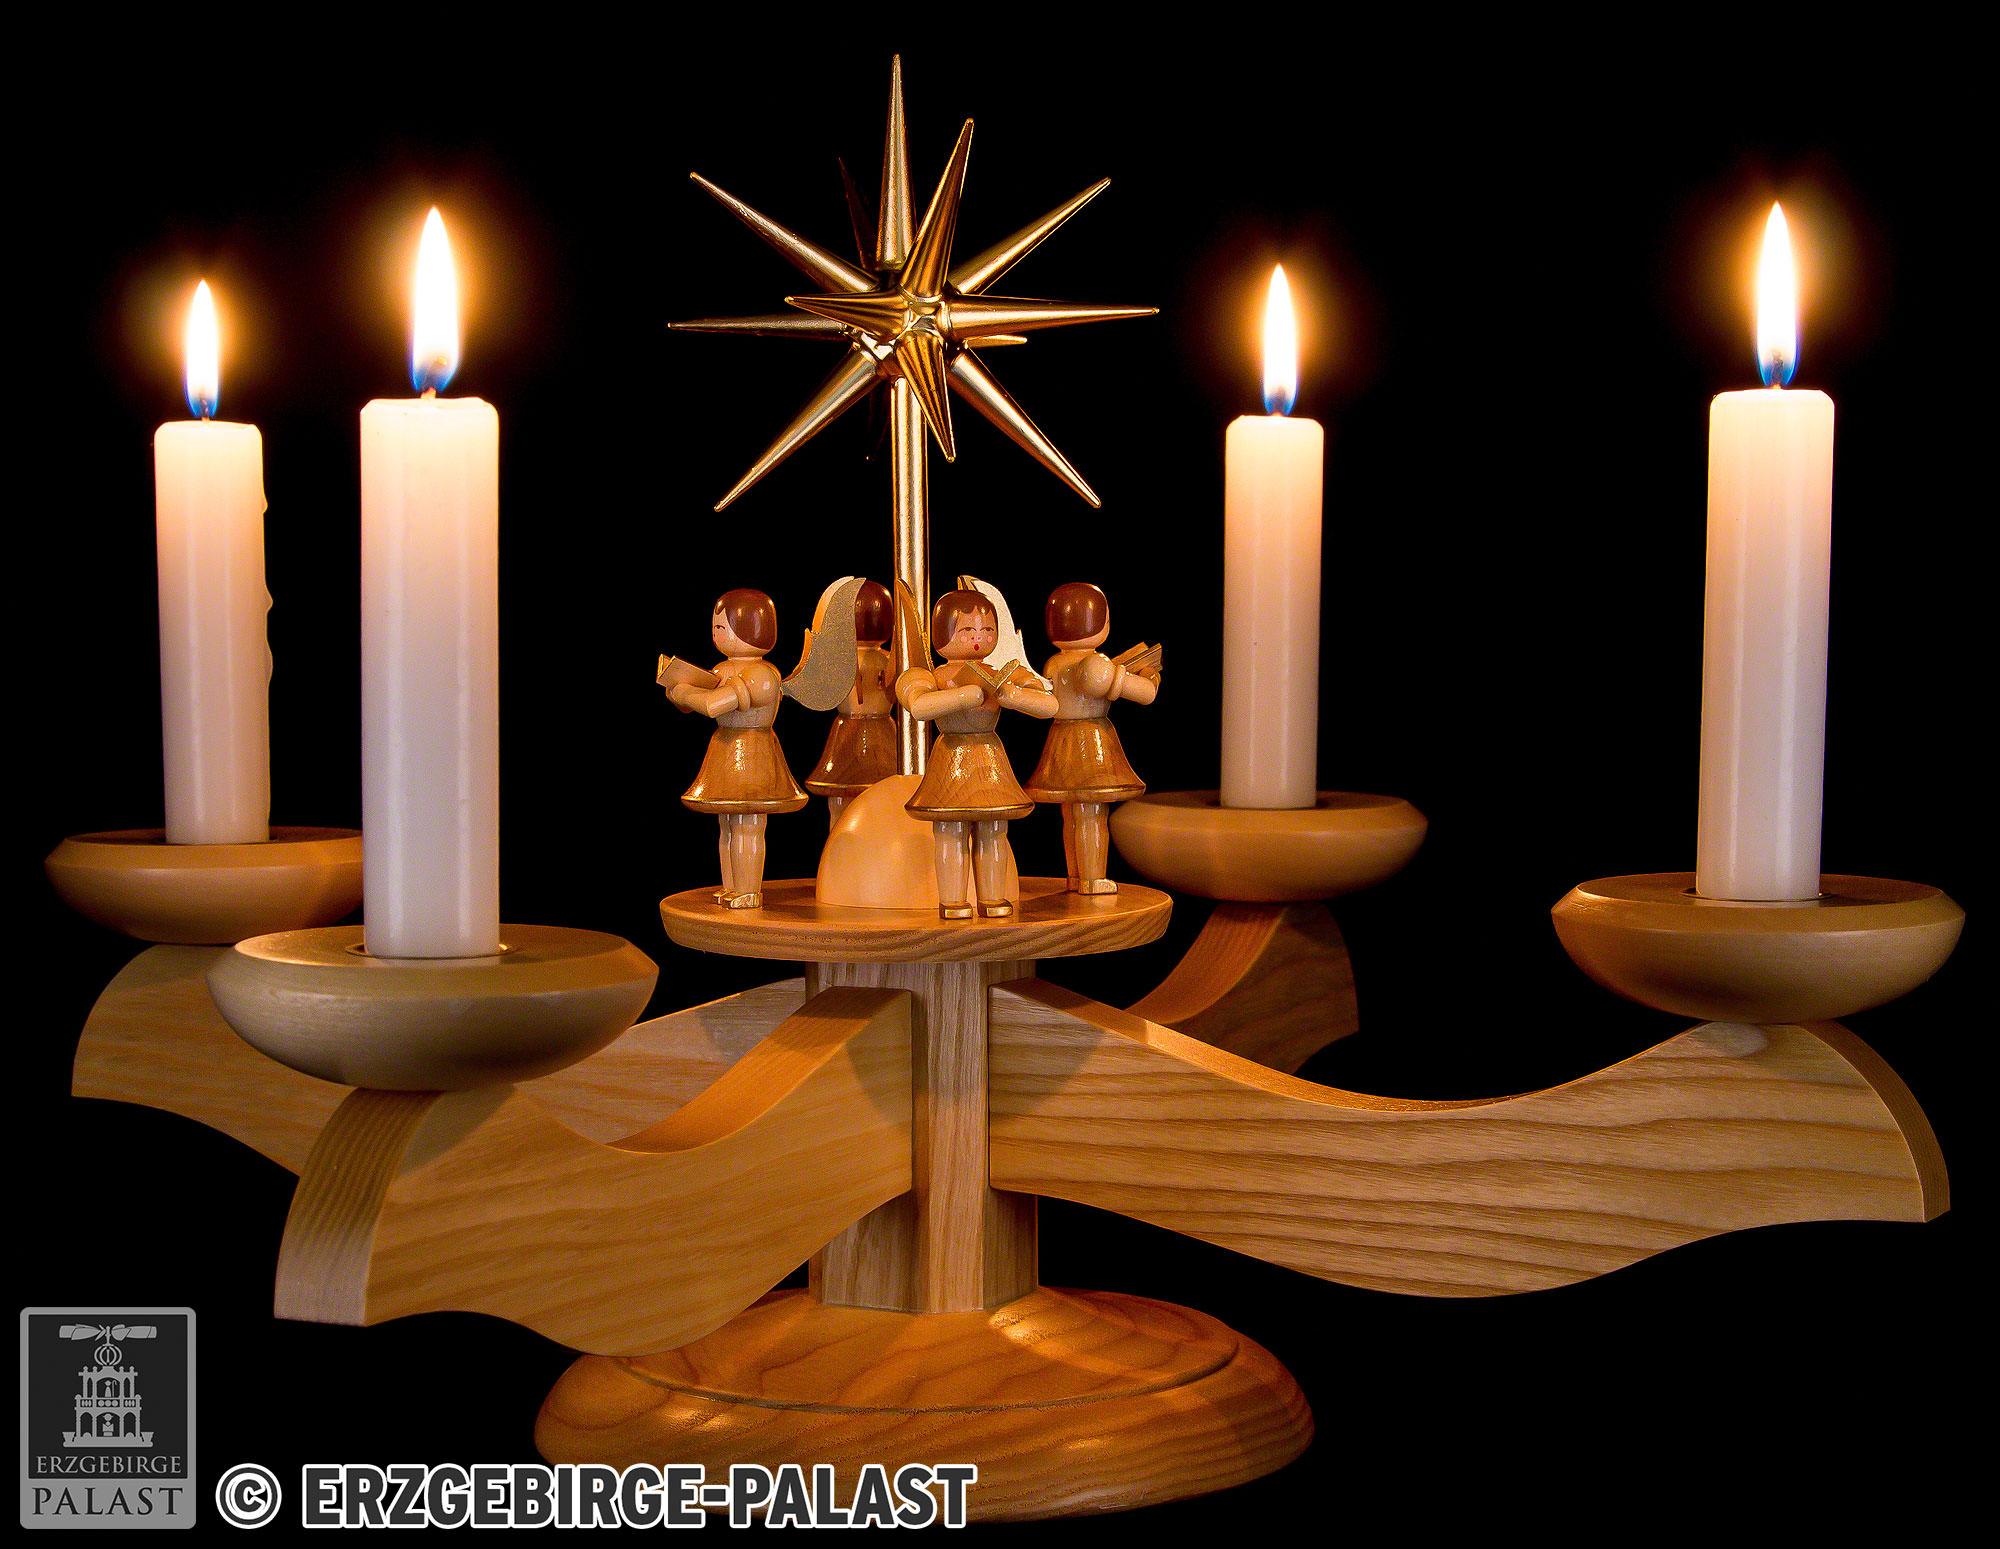 Candle Holder 4 Angels Natural 26 Cm 10 2in By Albin Preissler